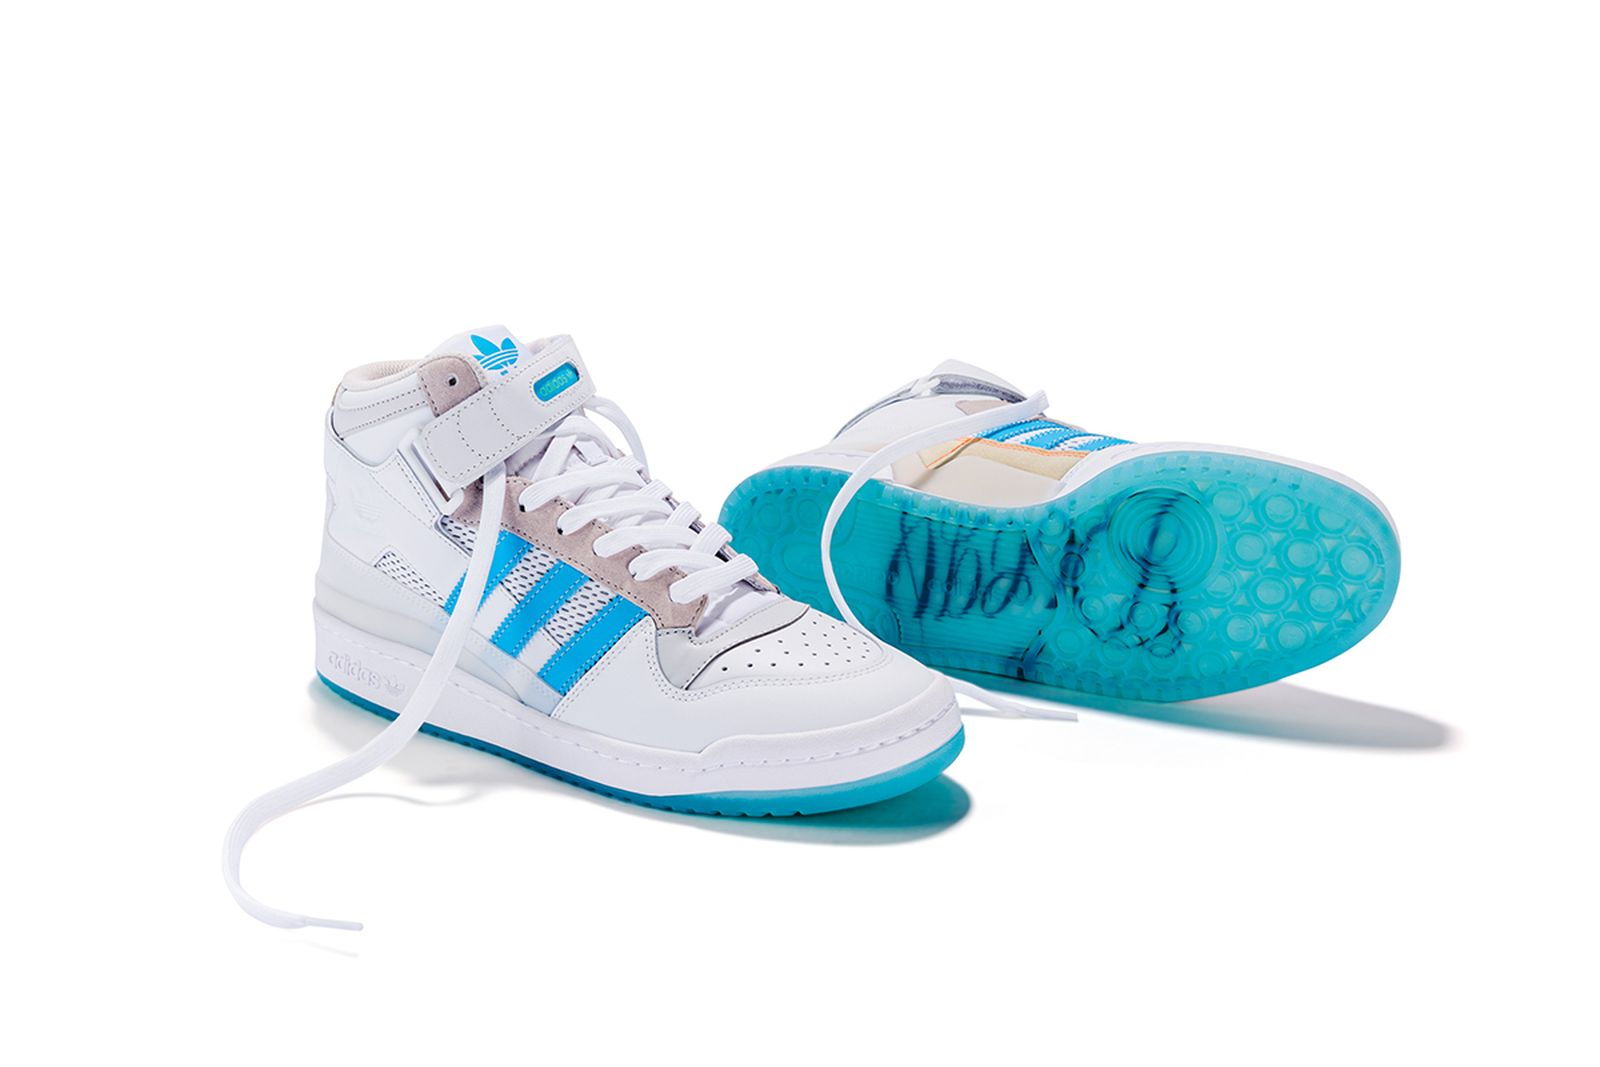 adidas-skateboarding-forum-84-adv-diego-najera-release-date-price-1-09